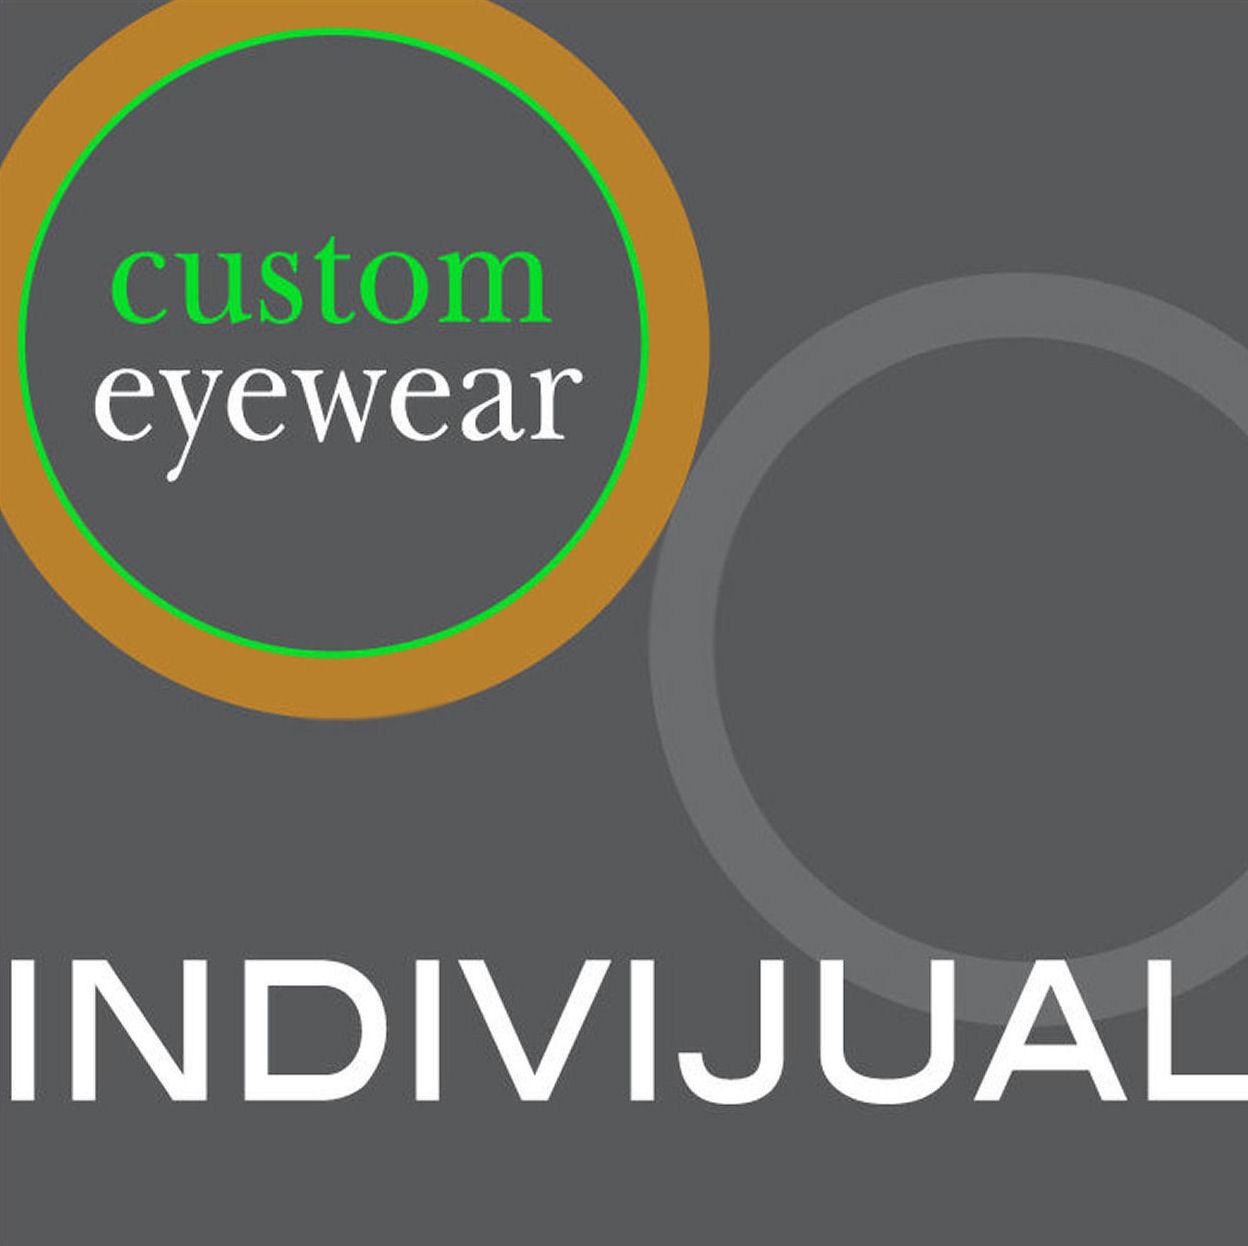 2b9d0306b791 Indivijual Custom Eyewear